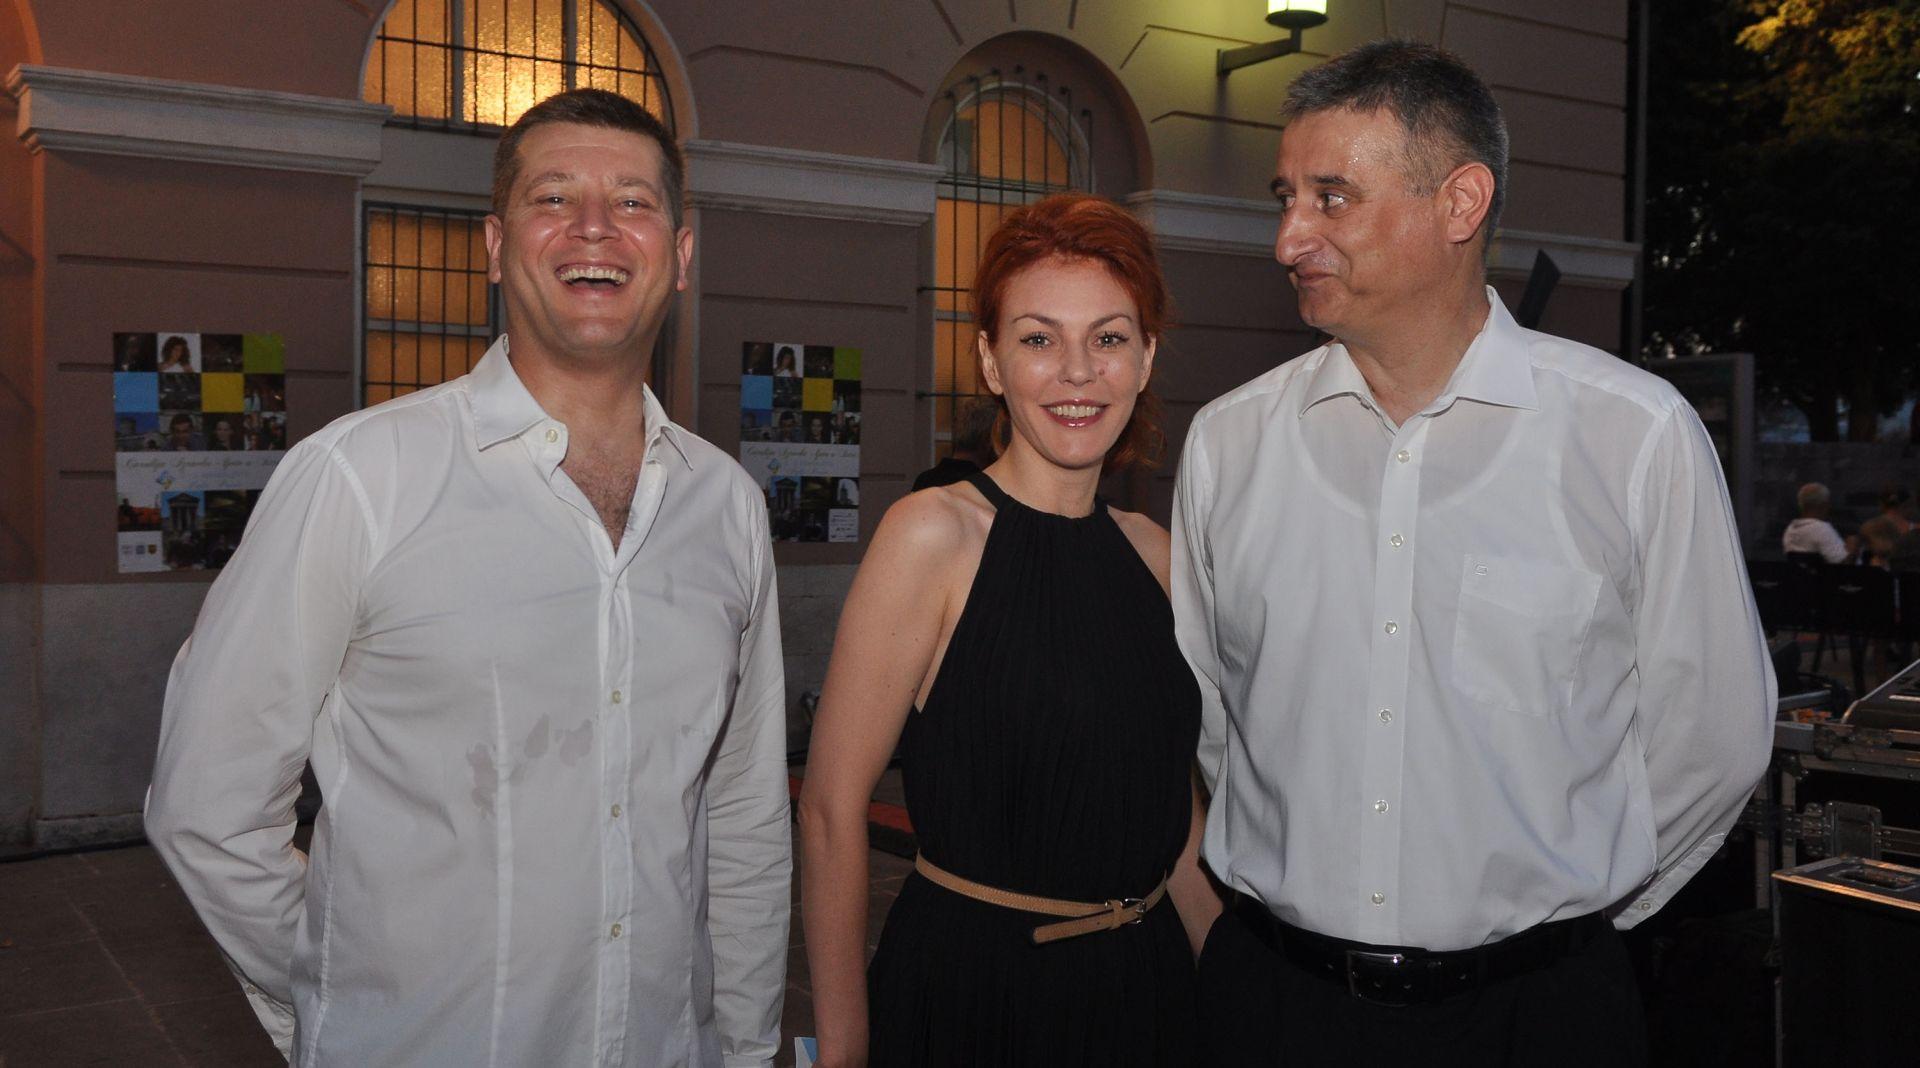 ČESTITALI I IZ SDP-A Tomislav Karamarko i Ana Šarić postali roditelji djevojčice